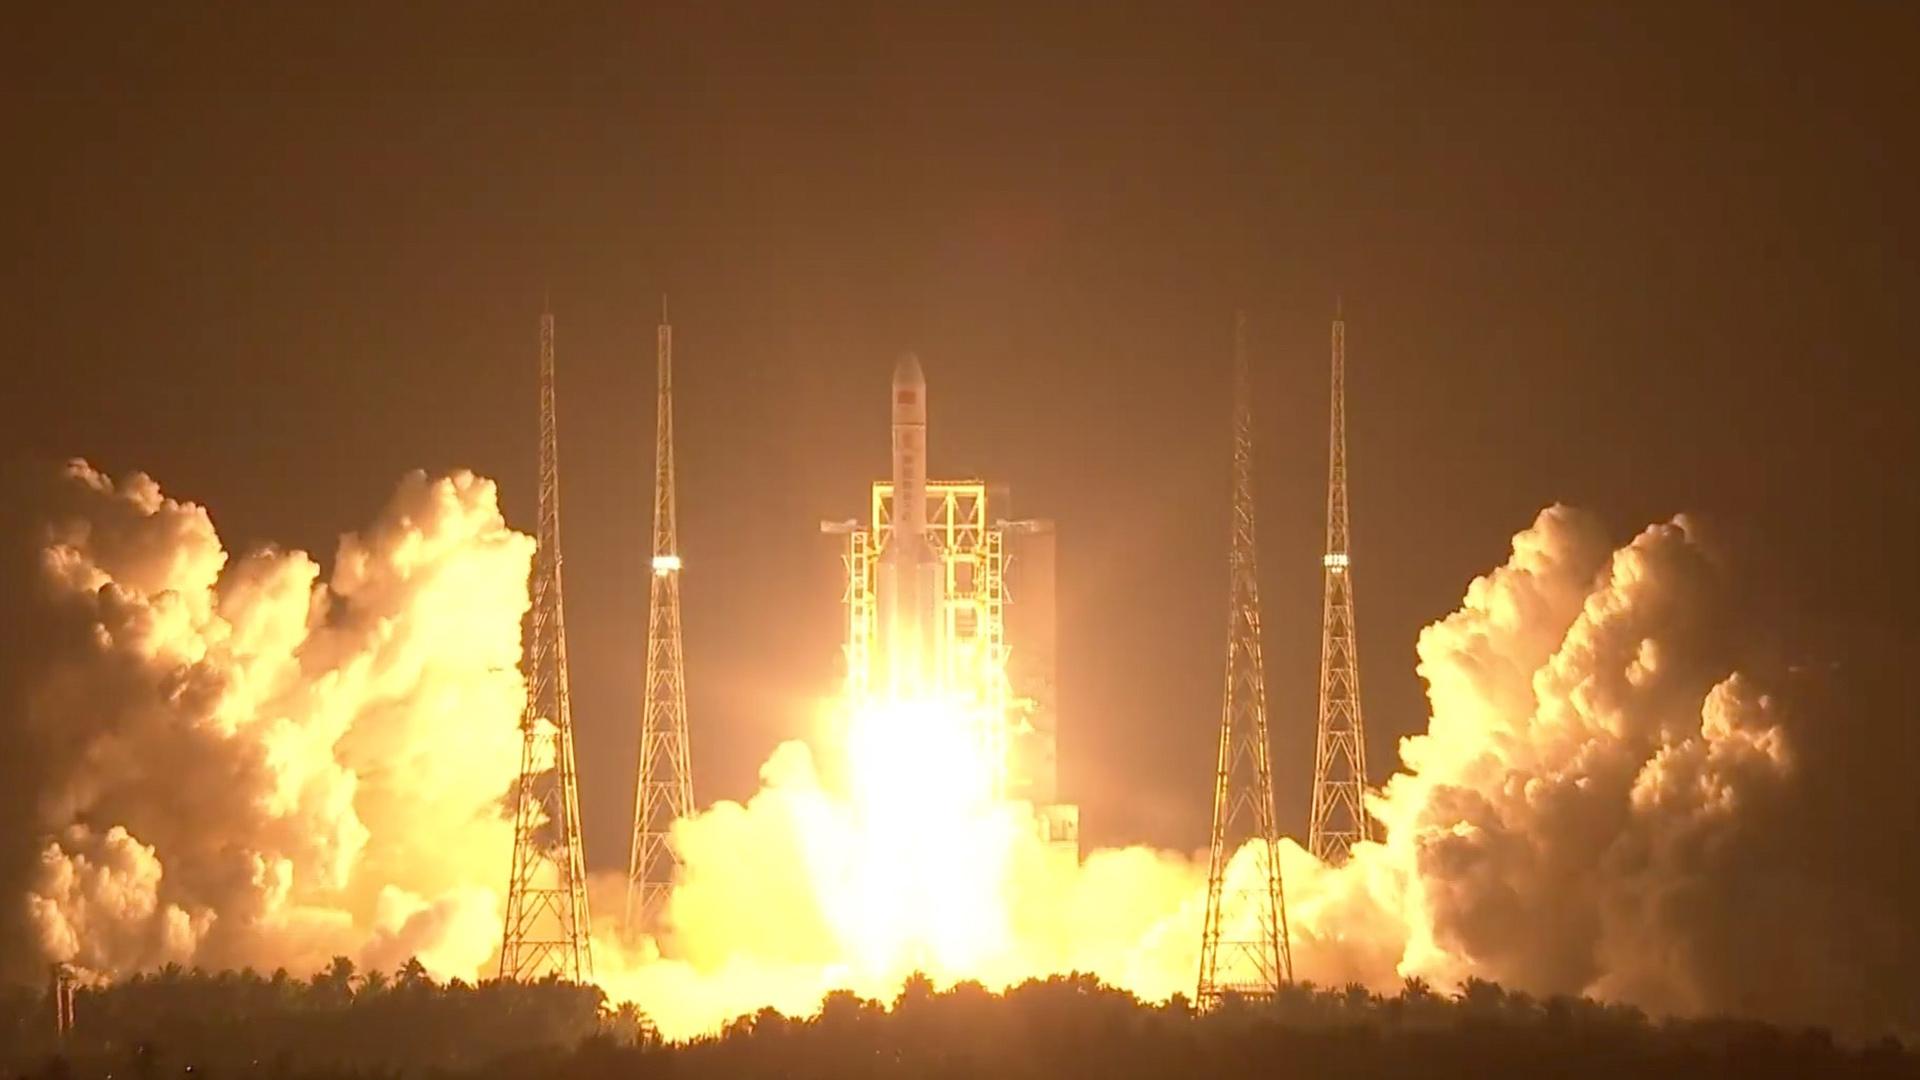 Global media hail China's Long March-5 rocket launch - CGTN